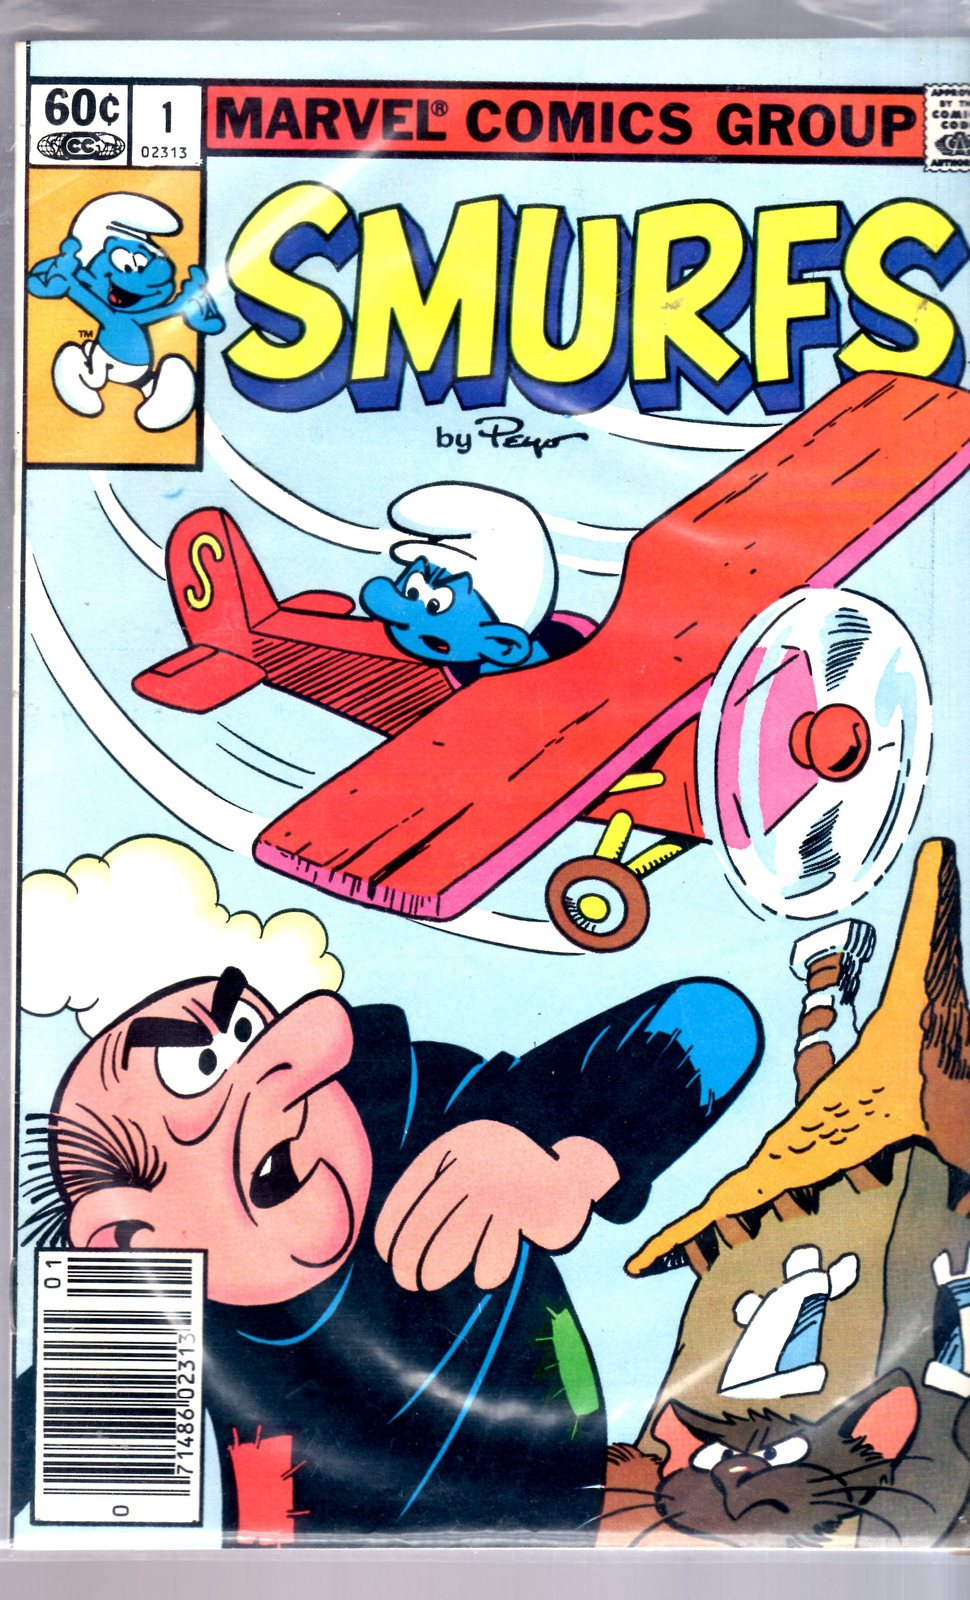 Marvel Comic book - Smurfs #1, 2, & 3 image 3